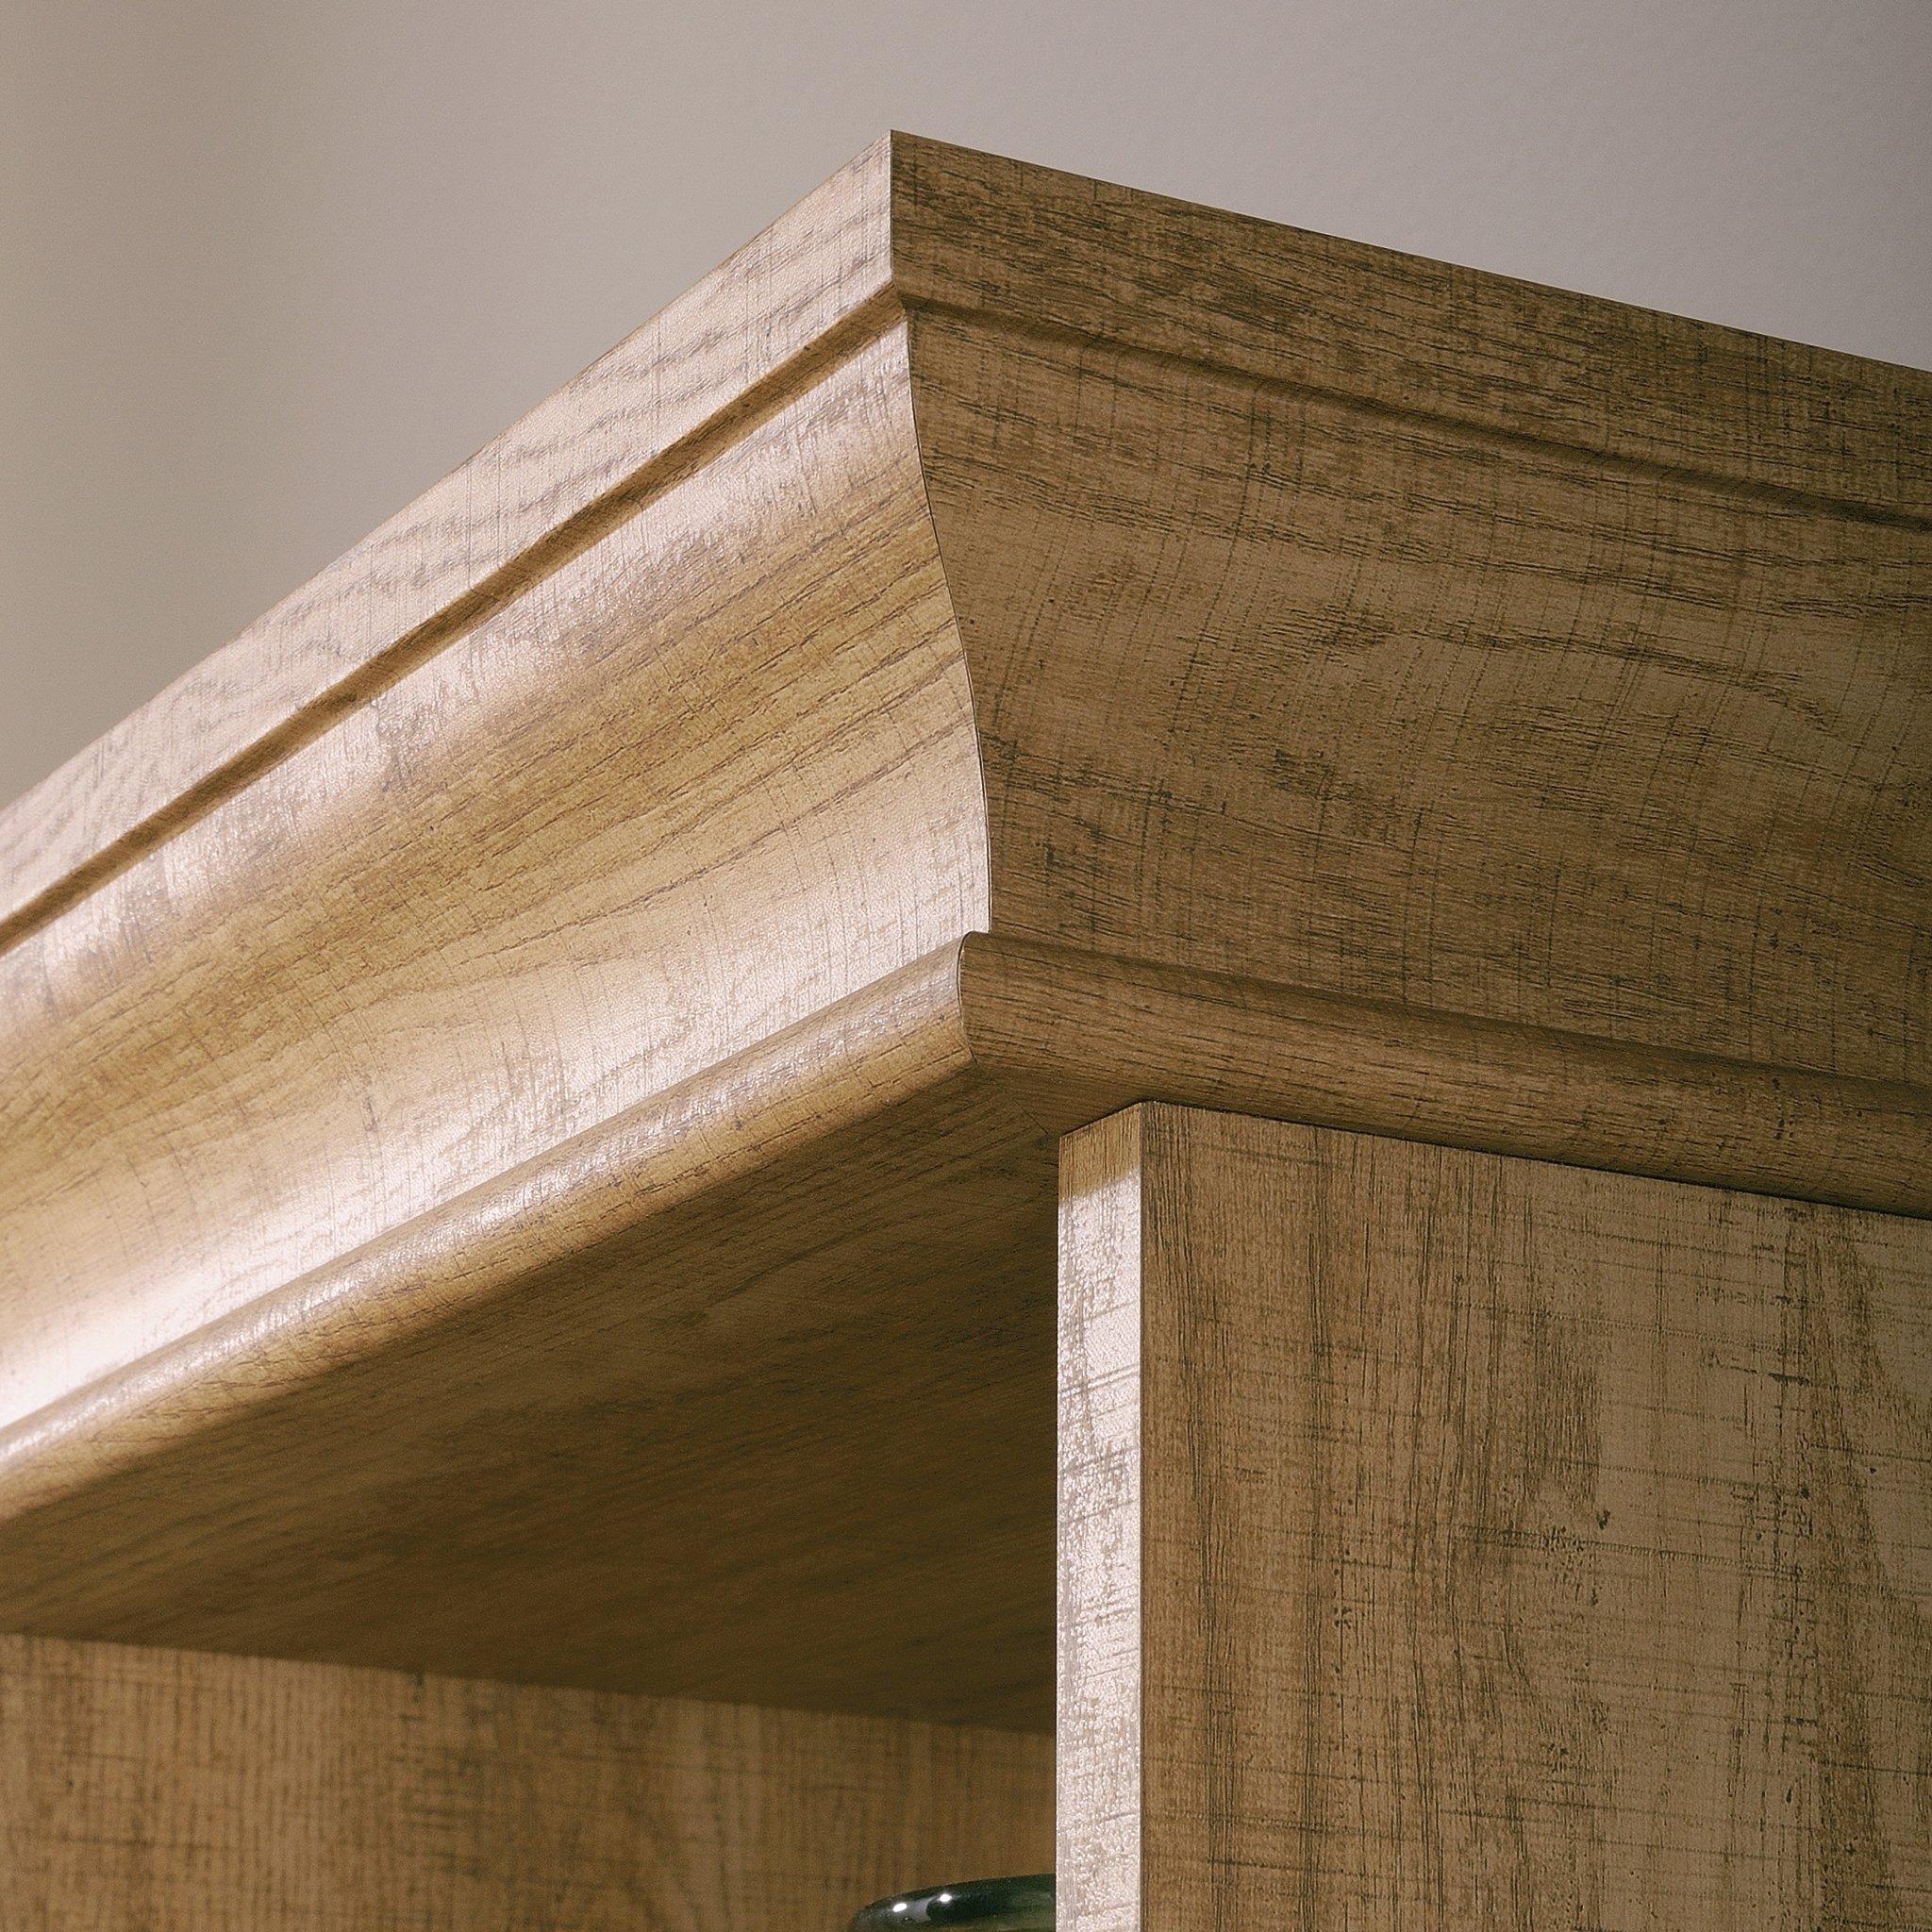 Sauder 414725 Barrister Lane Bookcase, L: 35.55'' x W: 13.50'' x H: 75.04'', Scribed Oak finish by Sauder (Image #8)